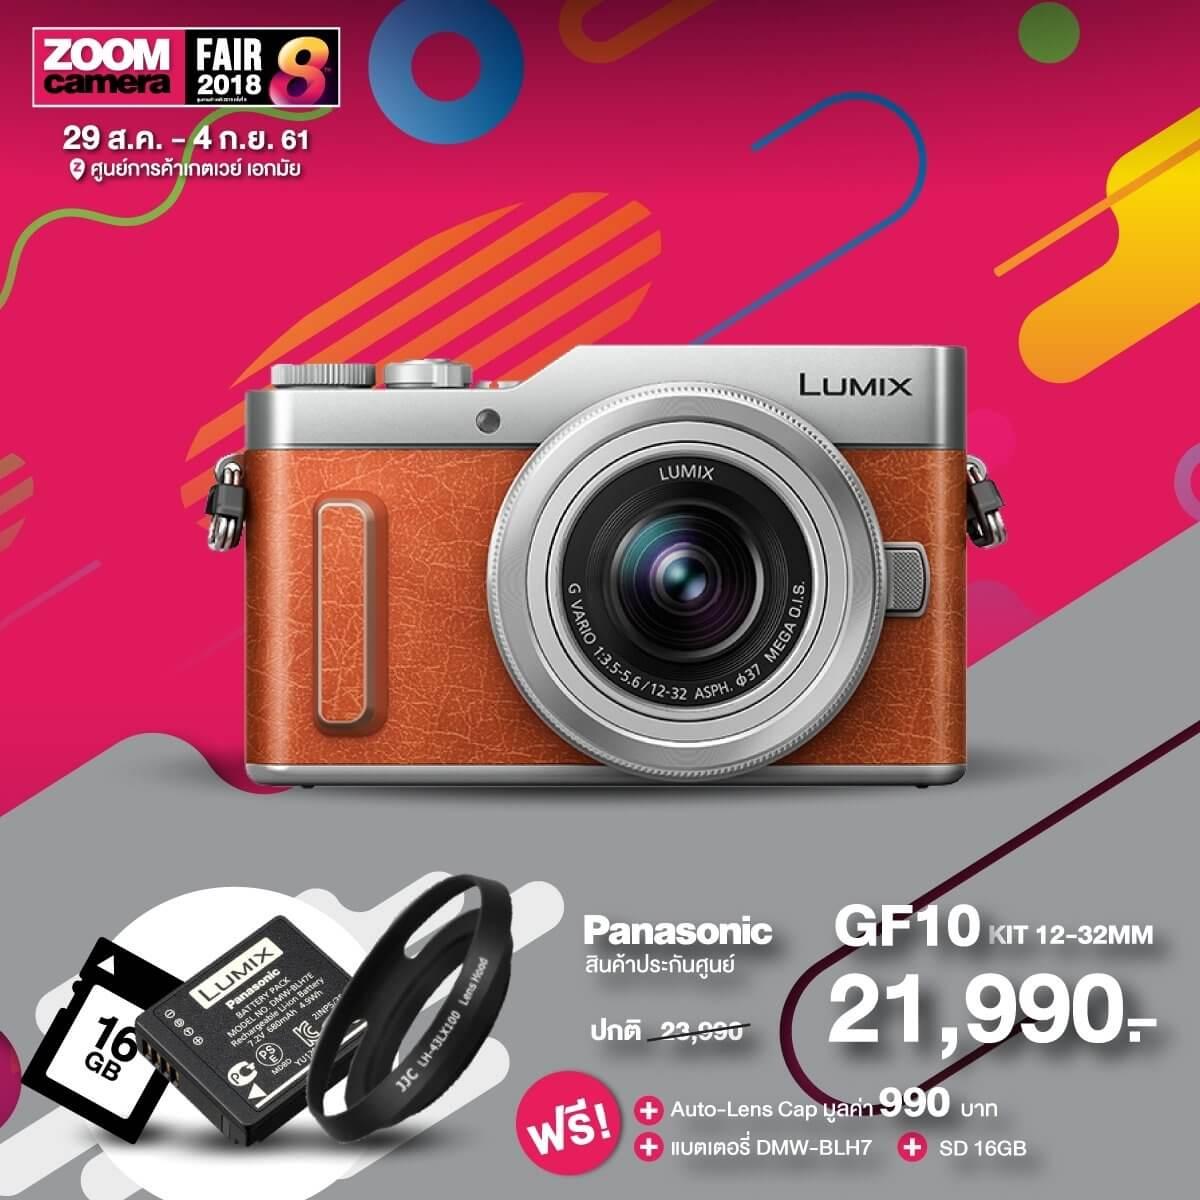 panasonic lumix gf10 kit1232 promotion